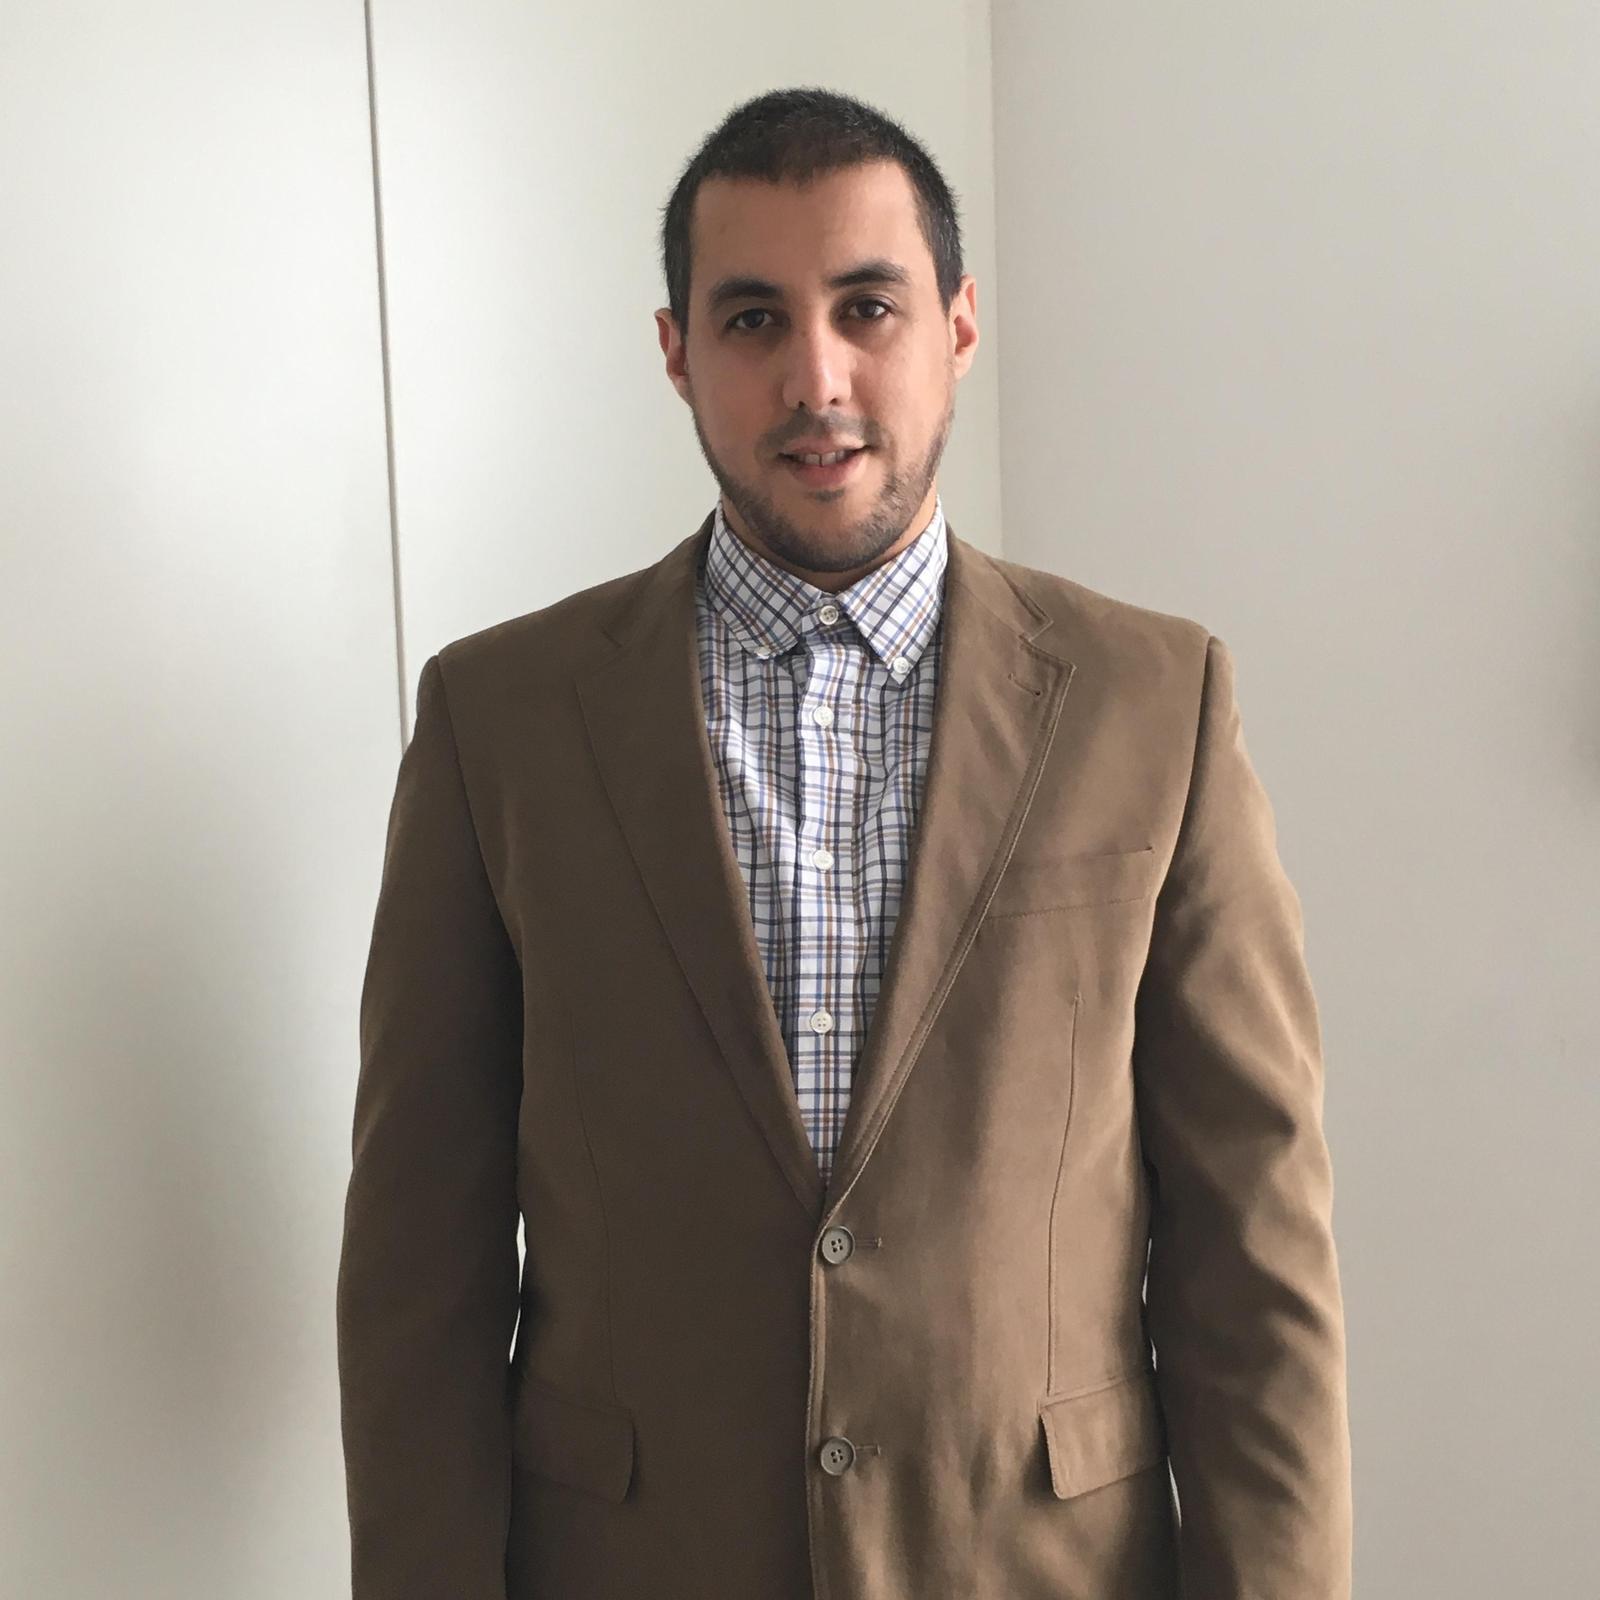 Mohamed Hidara - Stagiair fiscaal accountant in Leuven en Hasselt